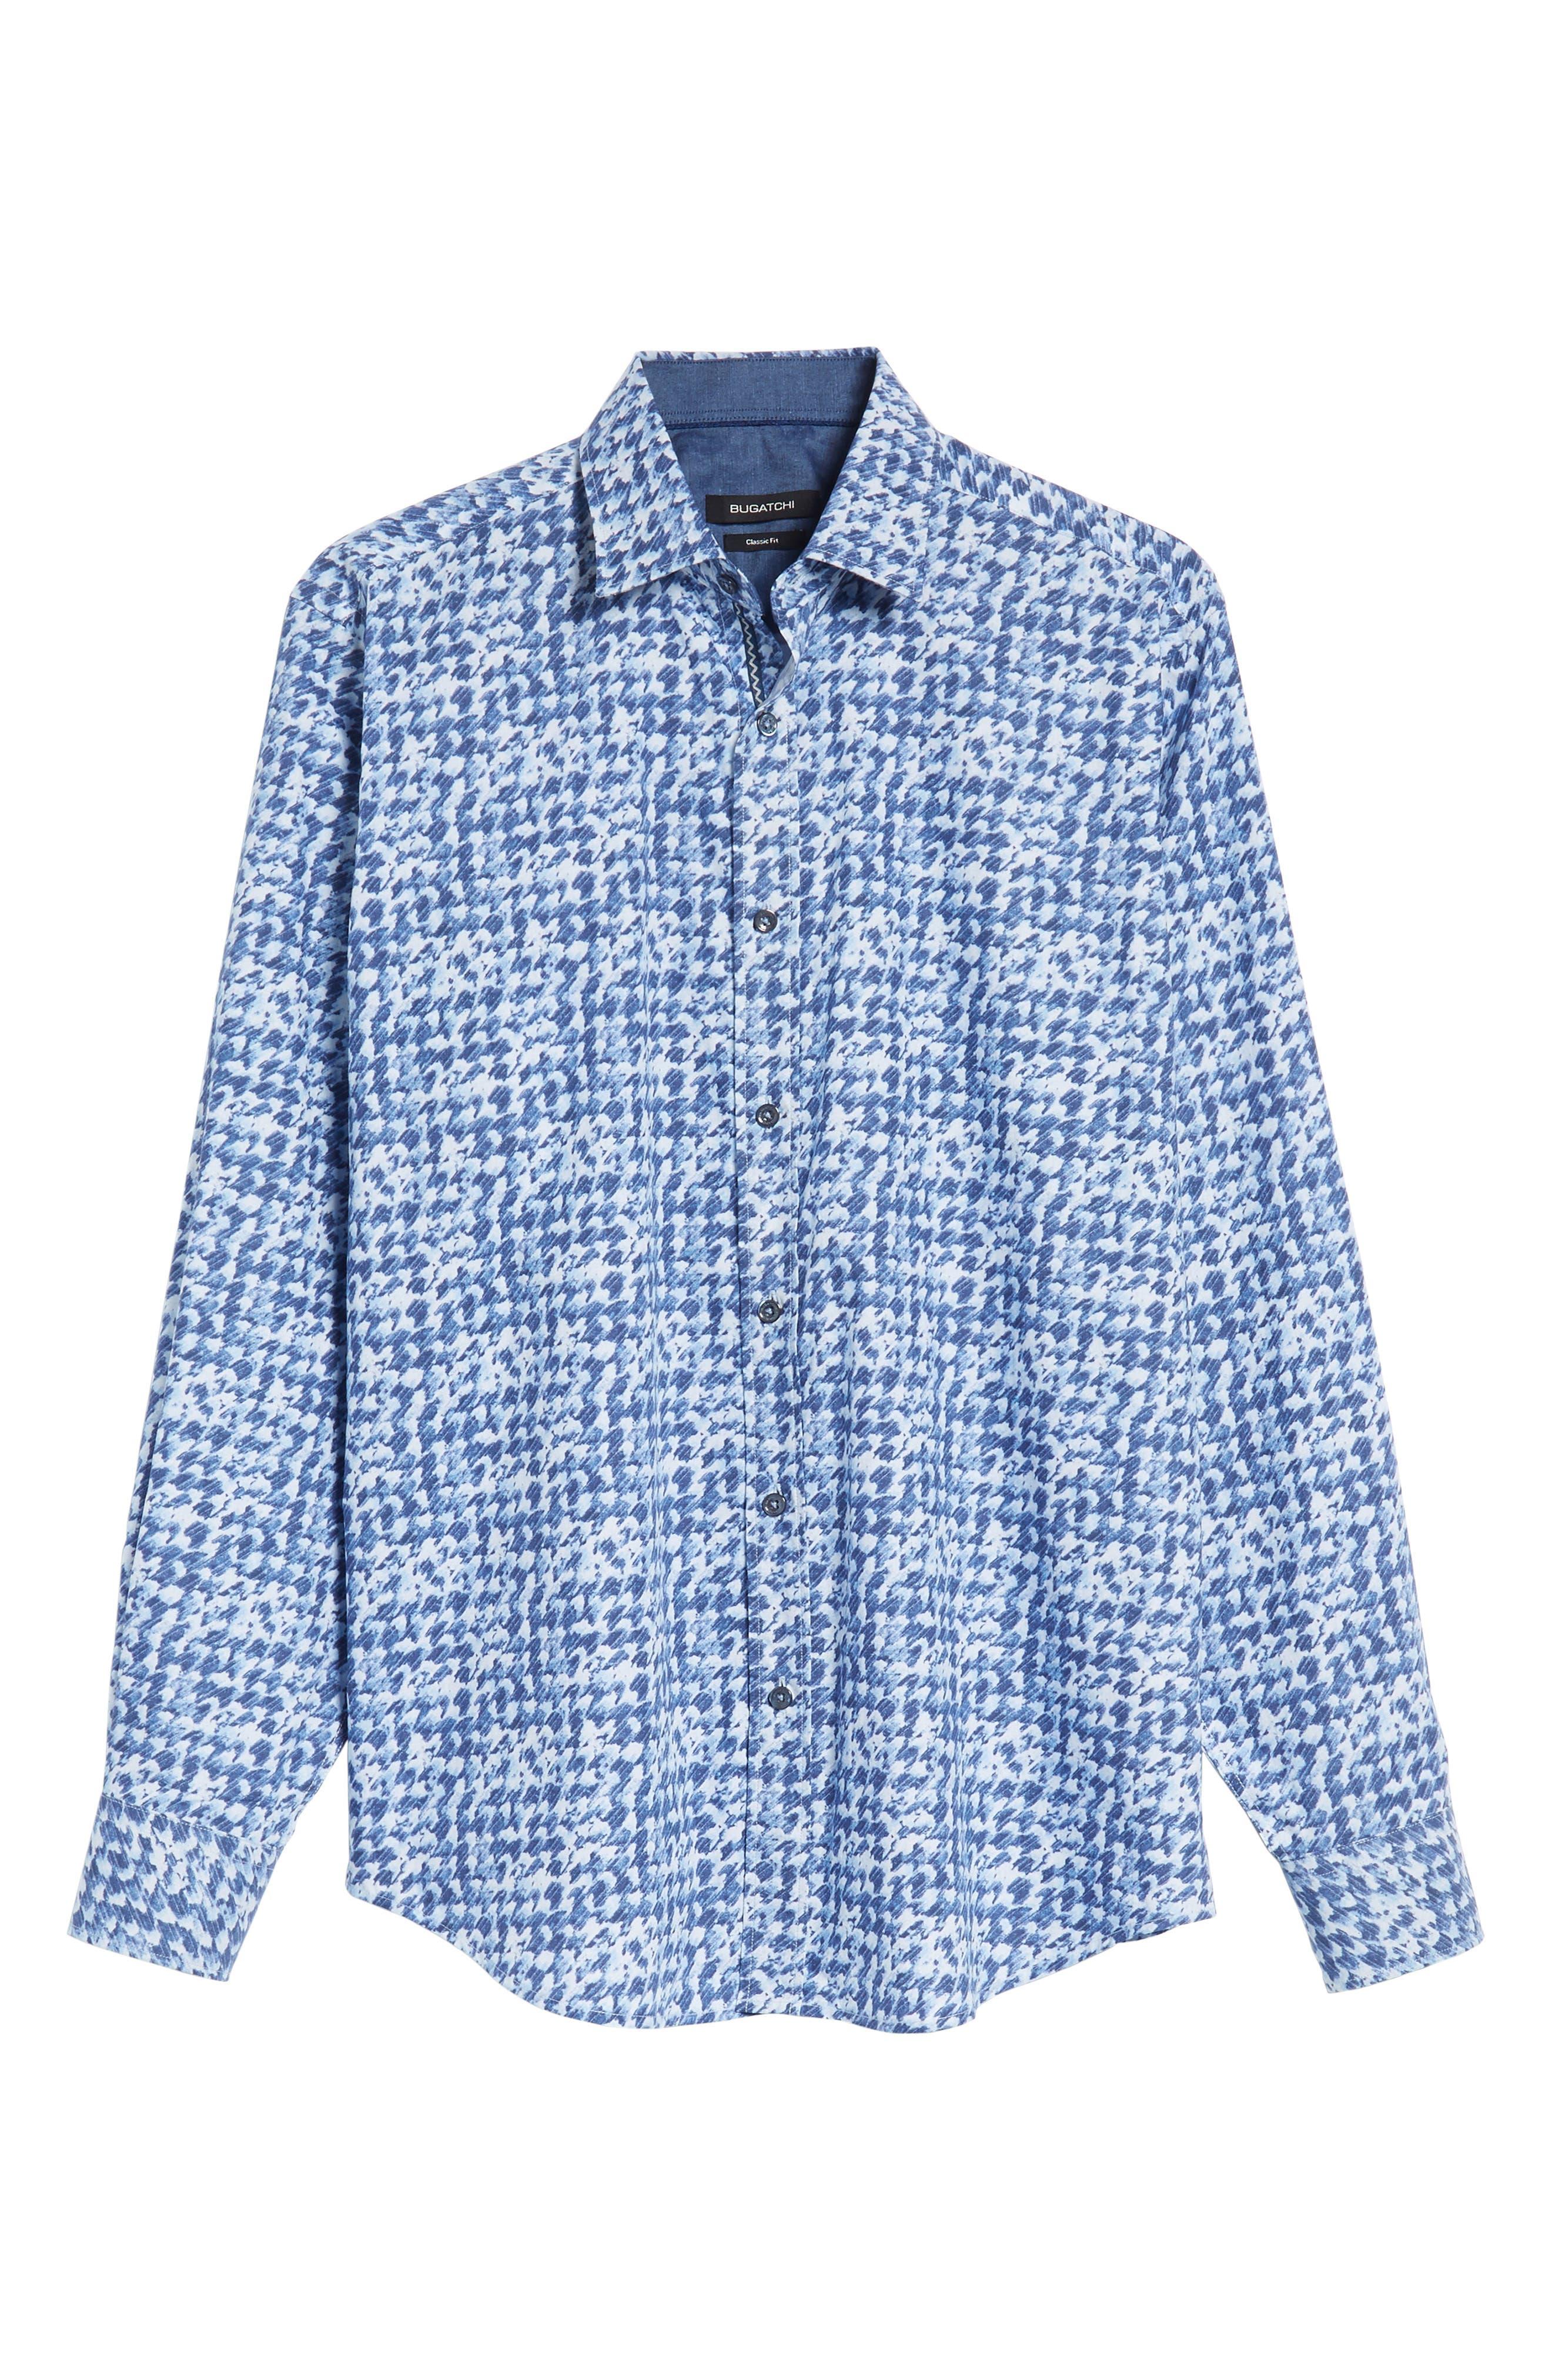 Classic Fit Patterned Sport Shirt,                             Alternate thumbnail 6, color,                             422